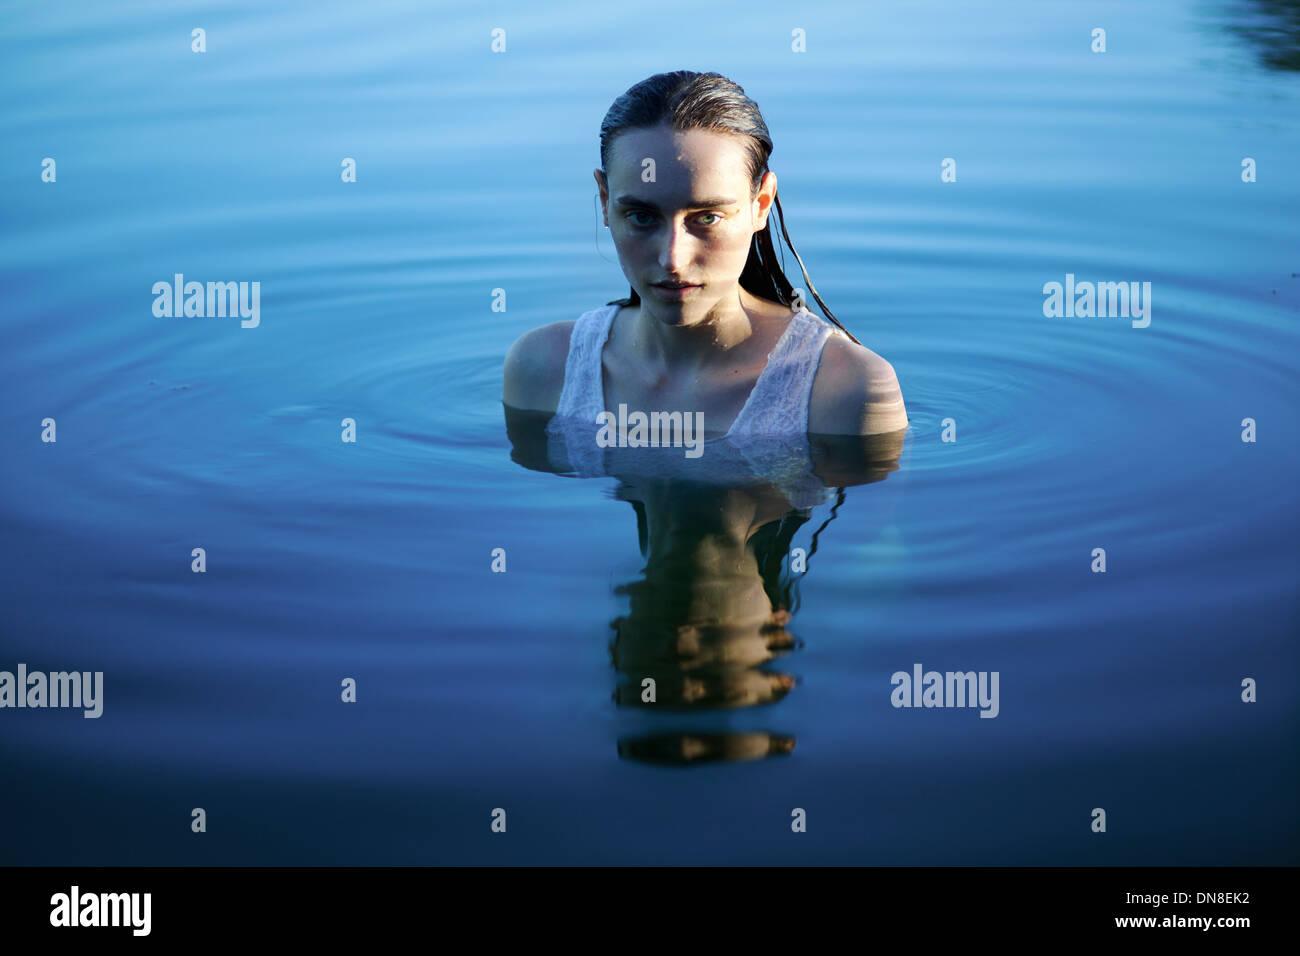 Junge Frau im Wasser, Porträt Stockbild